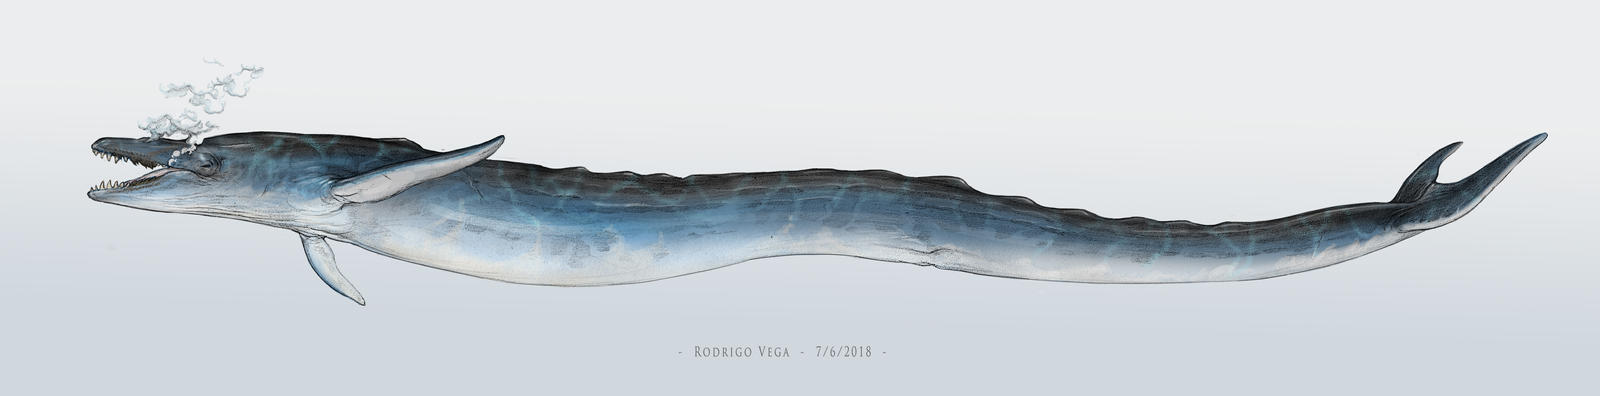 Whale Leviathan by Rodrigo-Vega